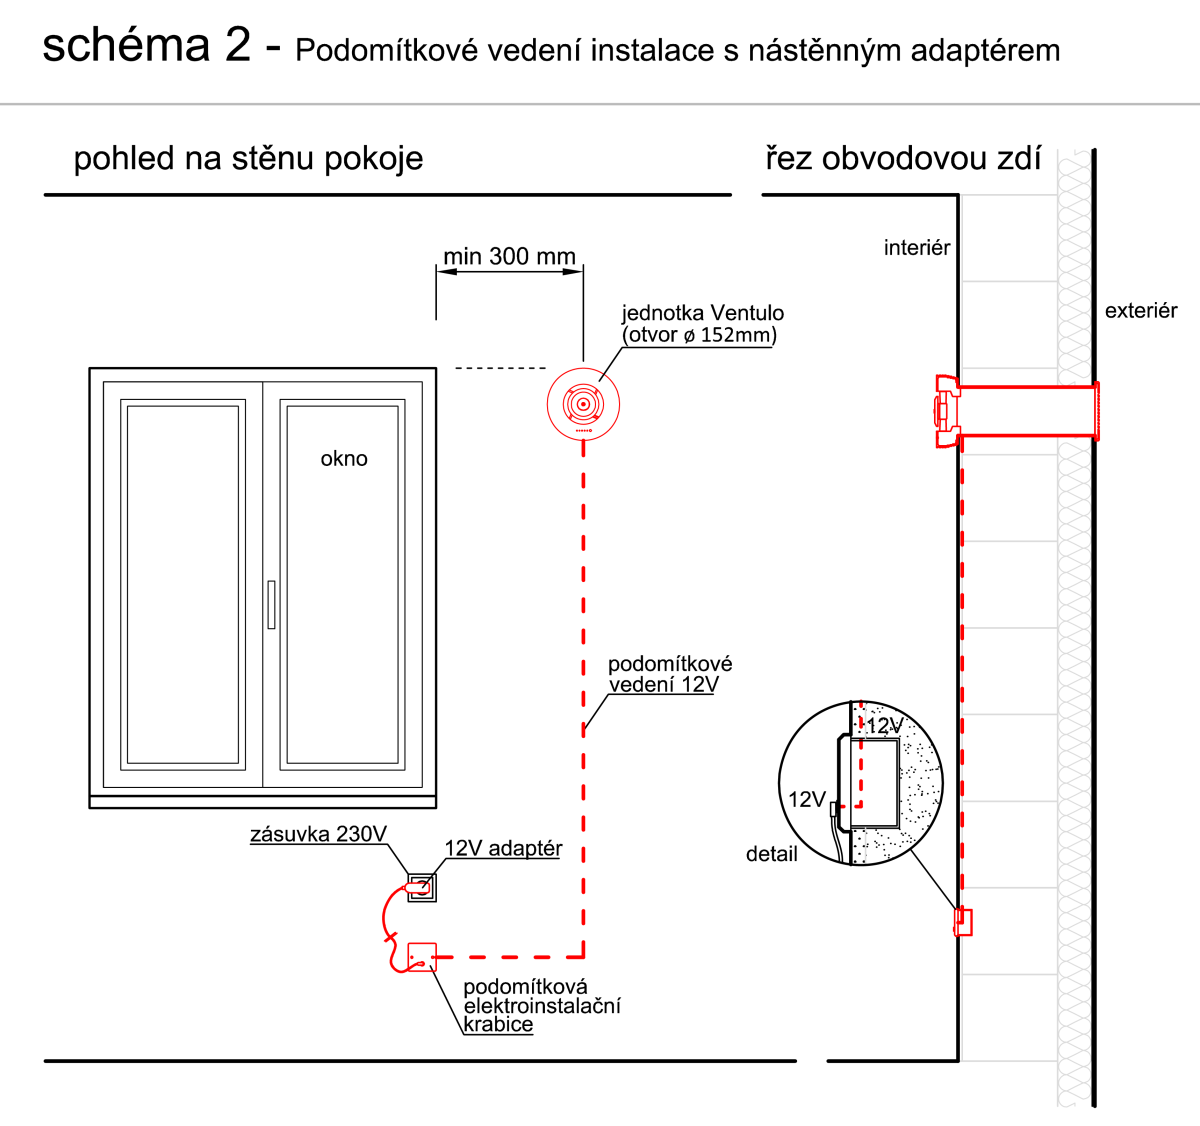 schéma 2 elektroinstalace jednotky Ventulo